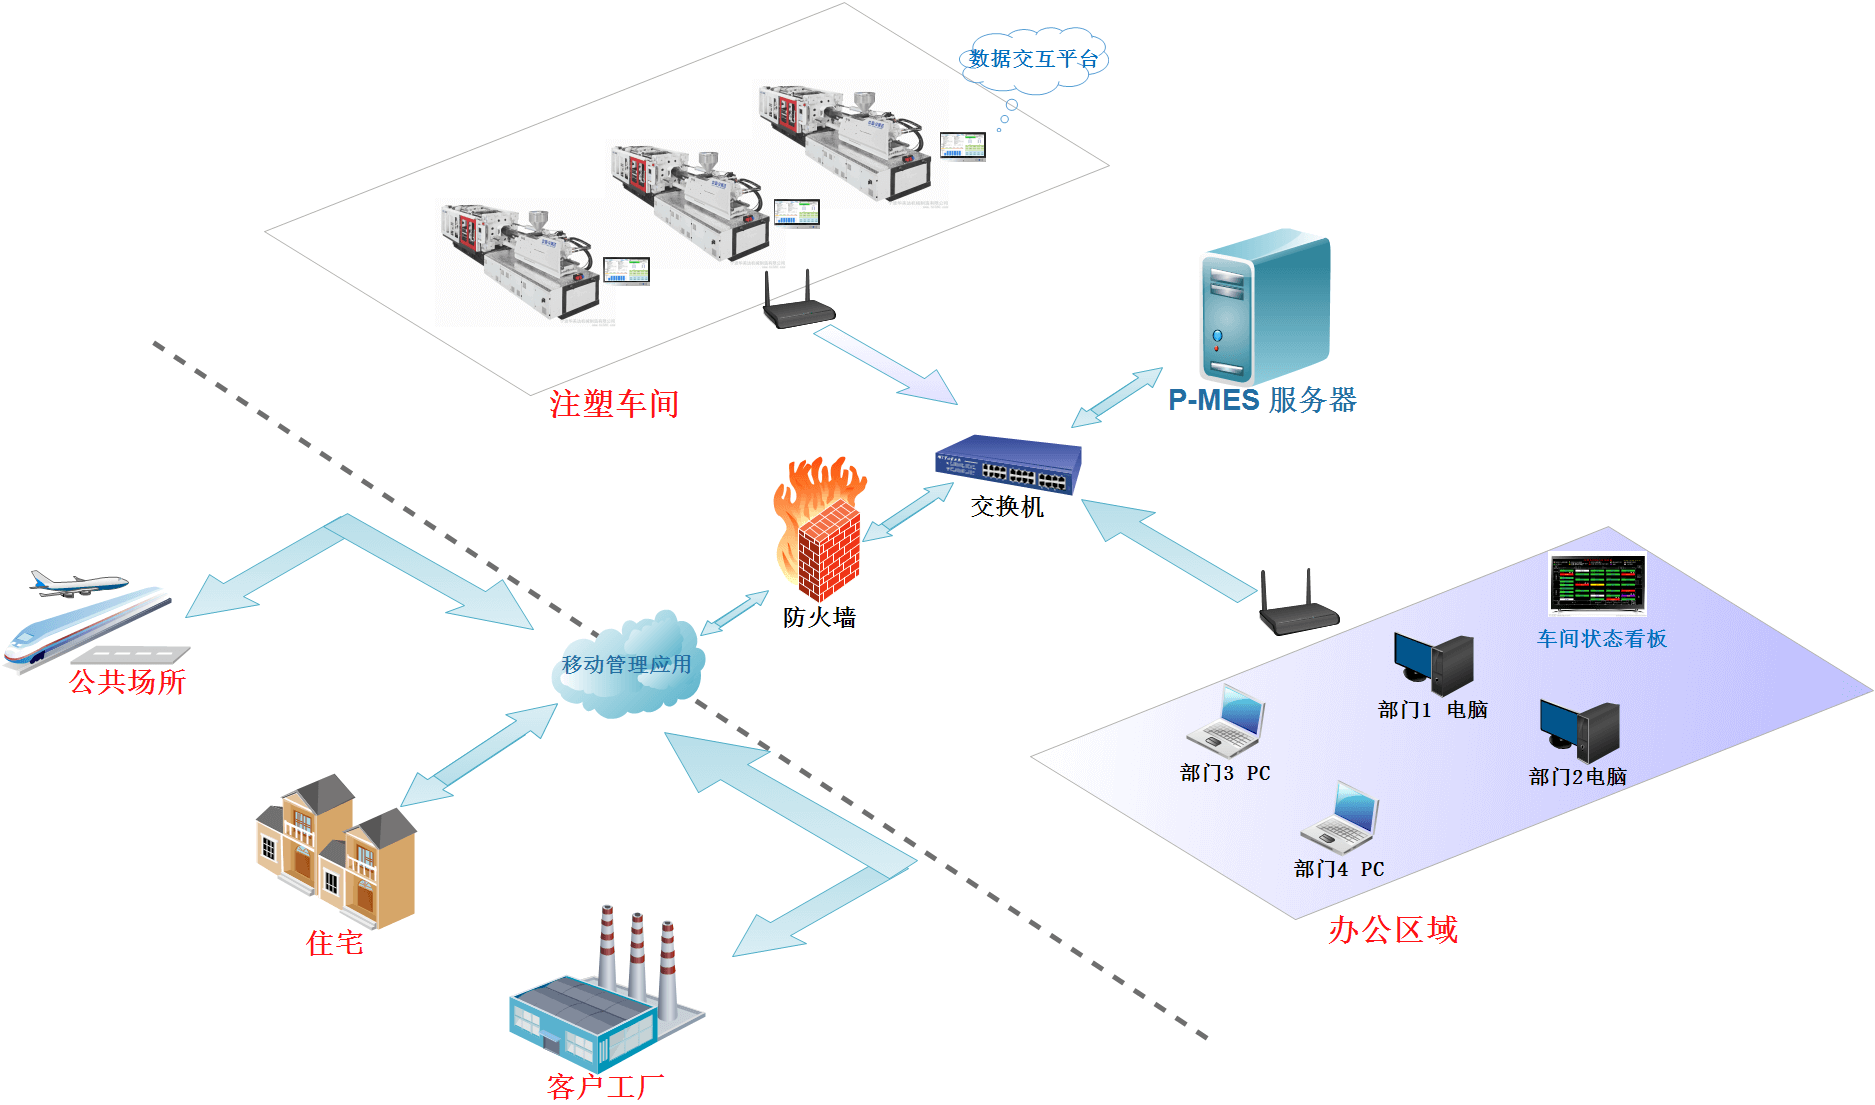 b/s结构,支持远程办公,结合互联网app移动应用,实现生产管理信息化